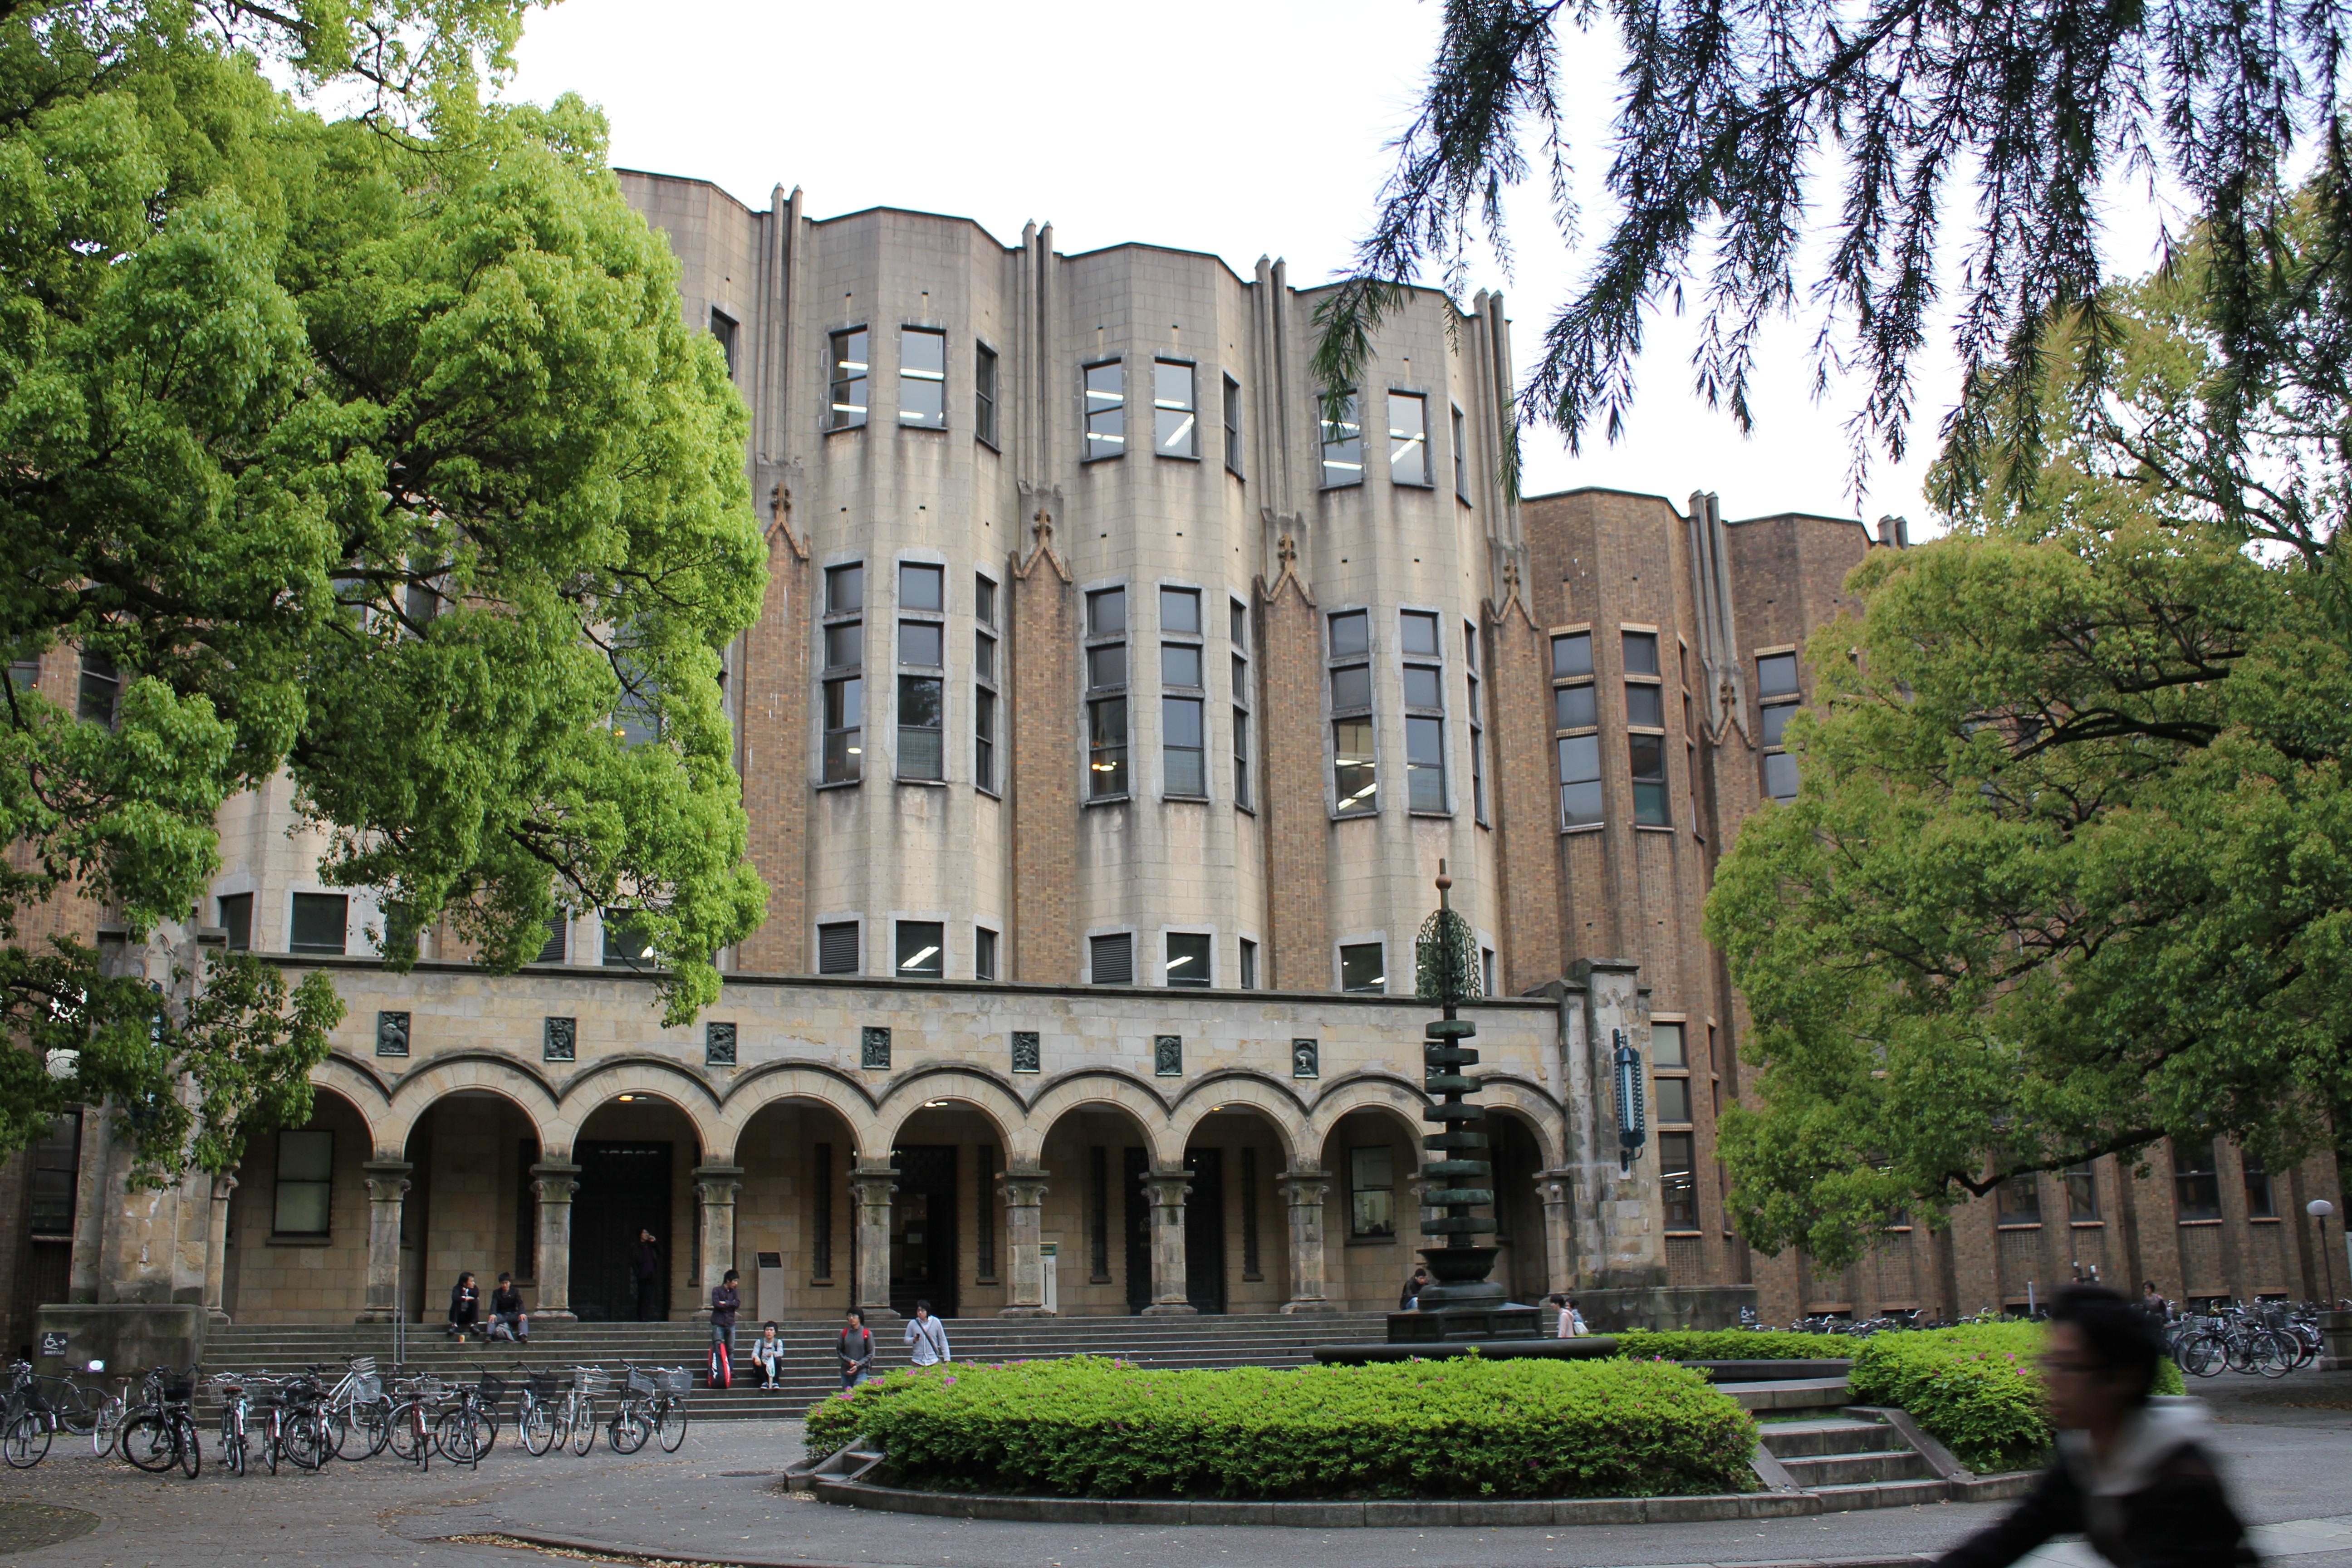 File:Tokyo university - Hongo campus - Main Library entrance.JPG: commons.wikimedia.org/wiki/File:Tokyo_university_-_Hongo_campus...